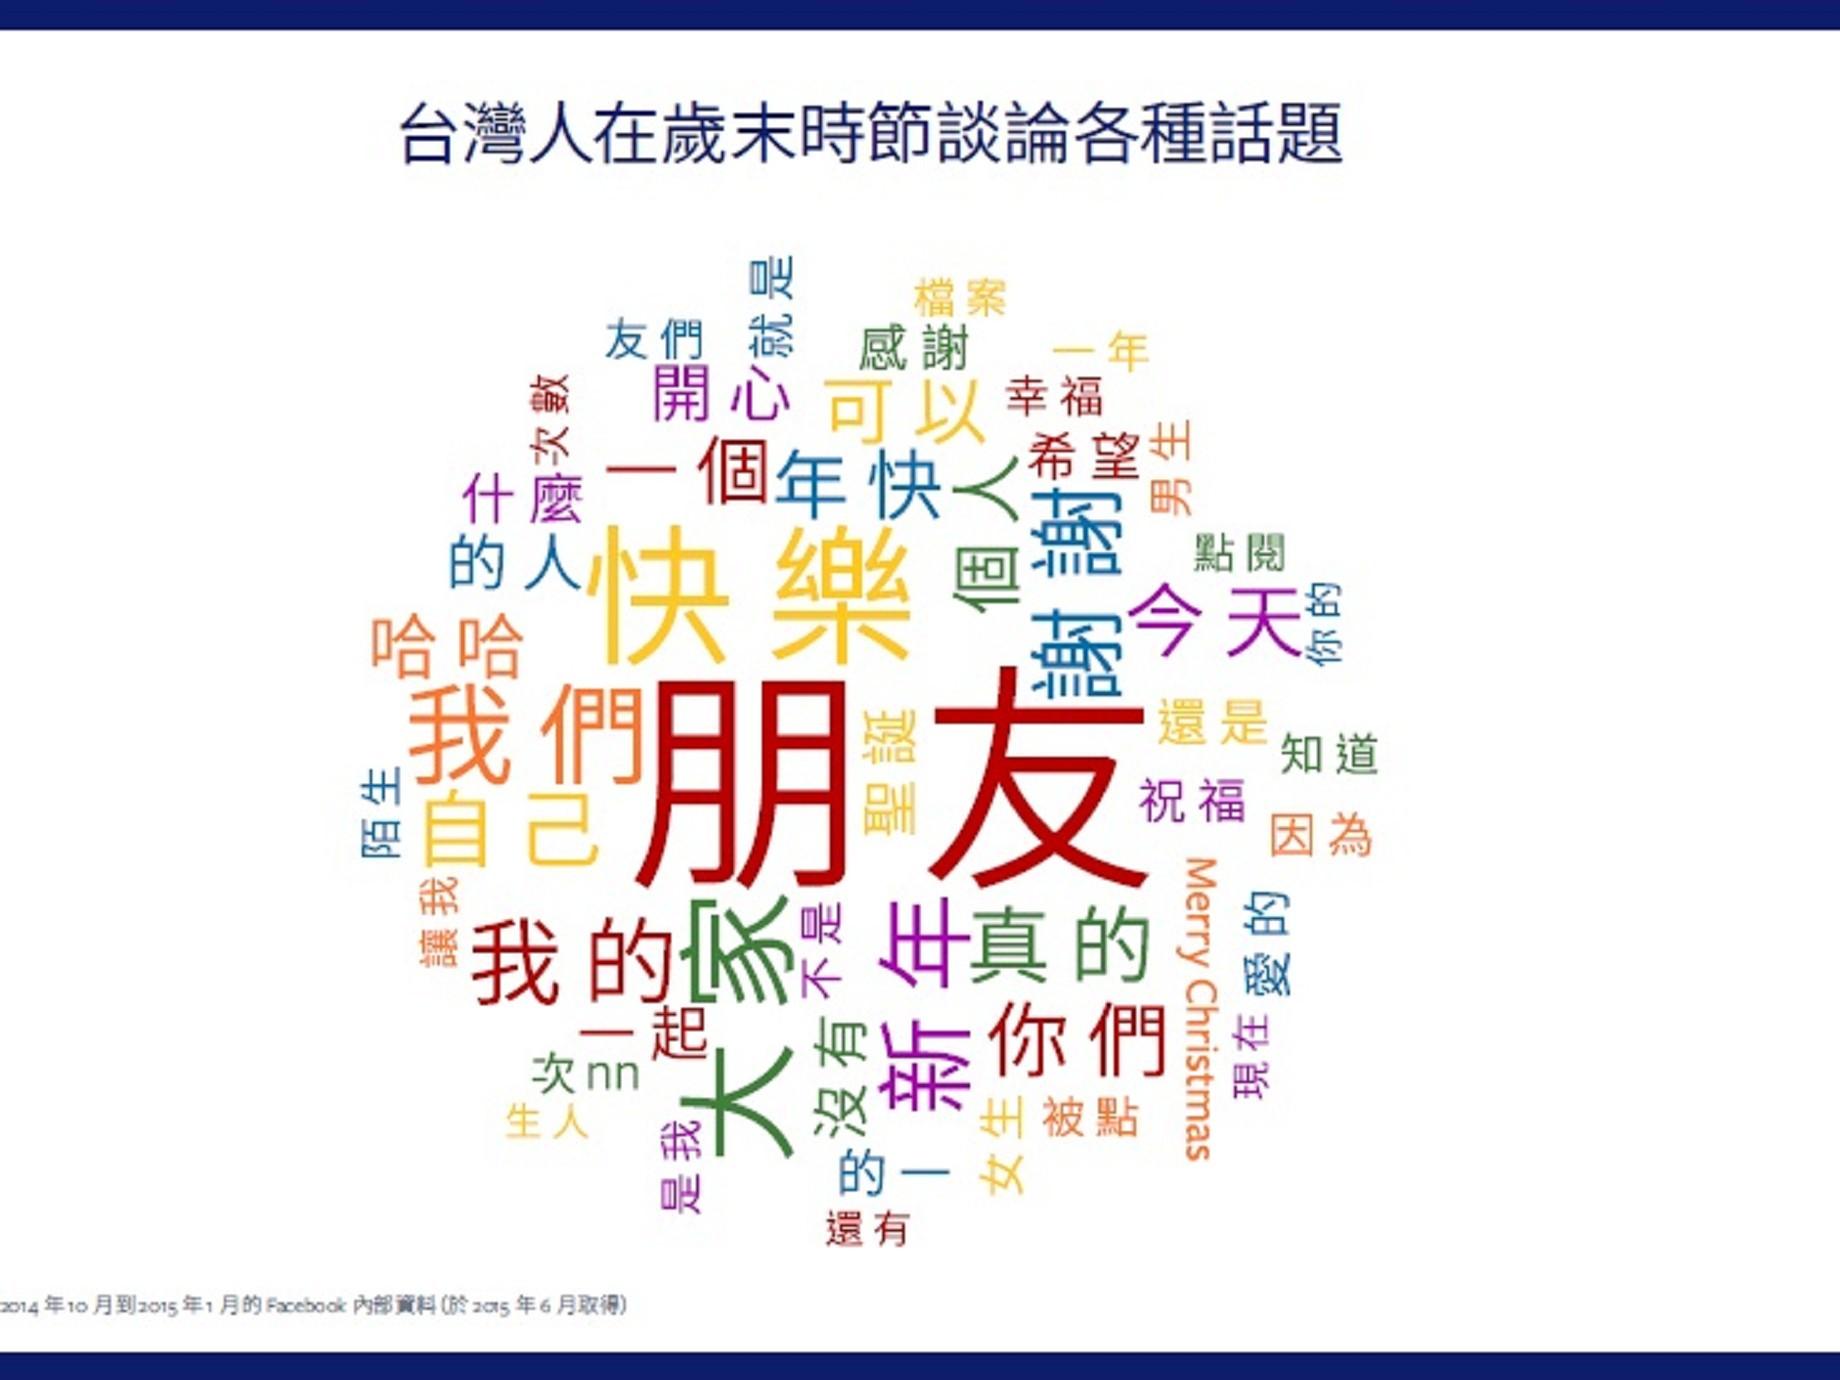 FB 揭開網購秘密:原來台灣人都喜歡這時候上網買機票